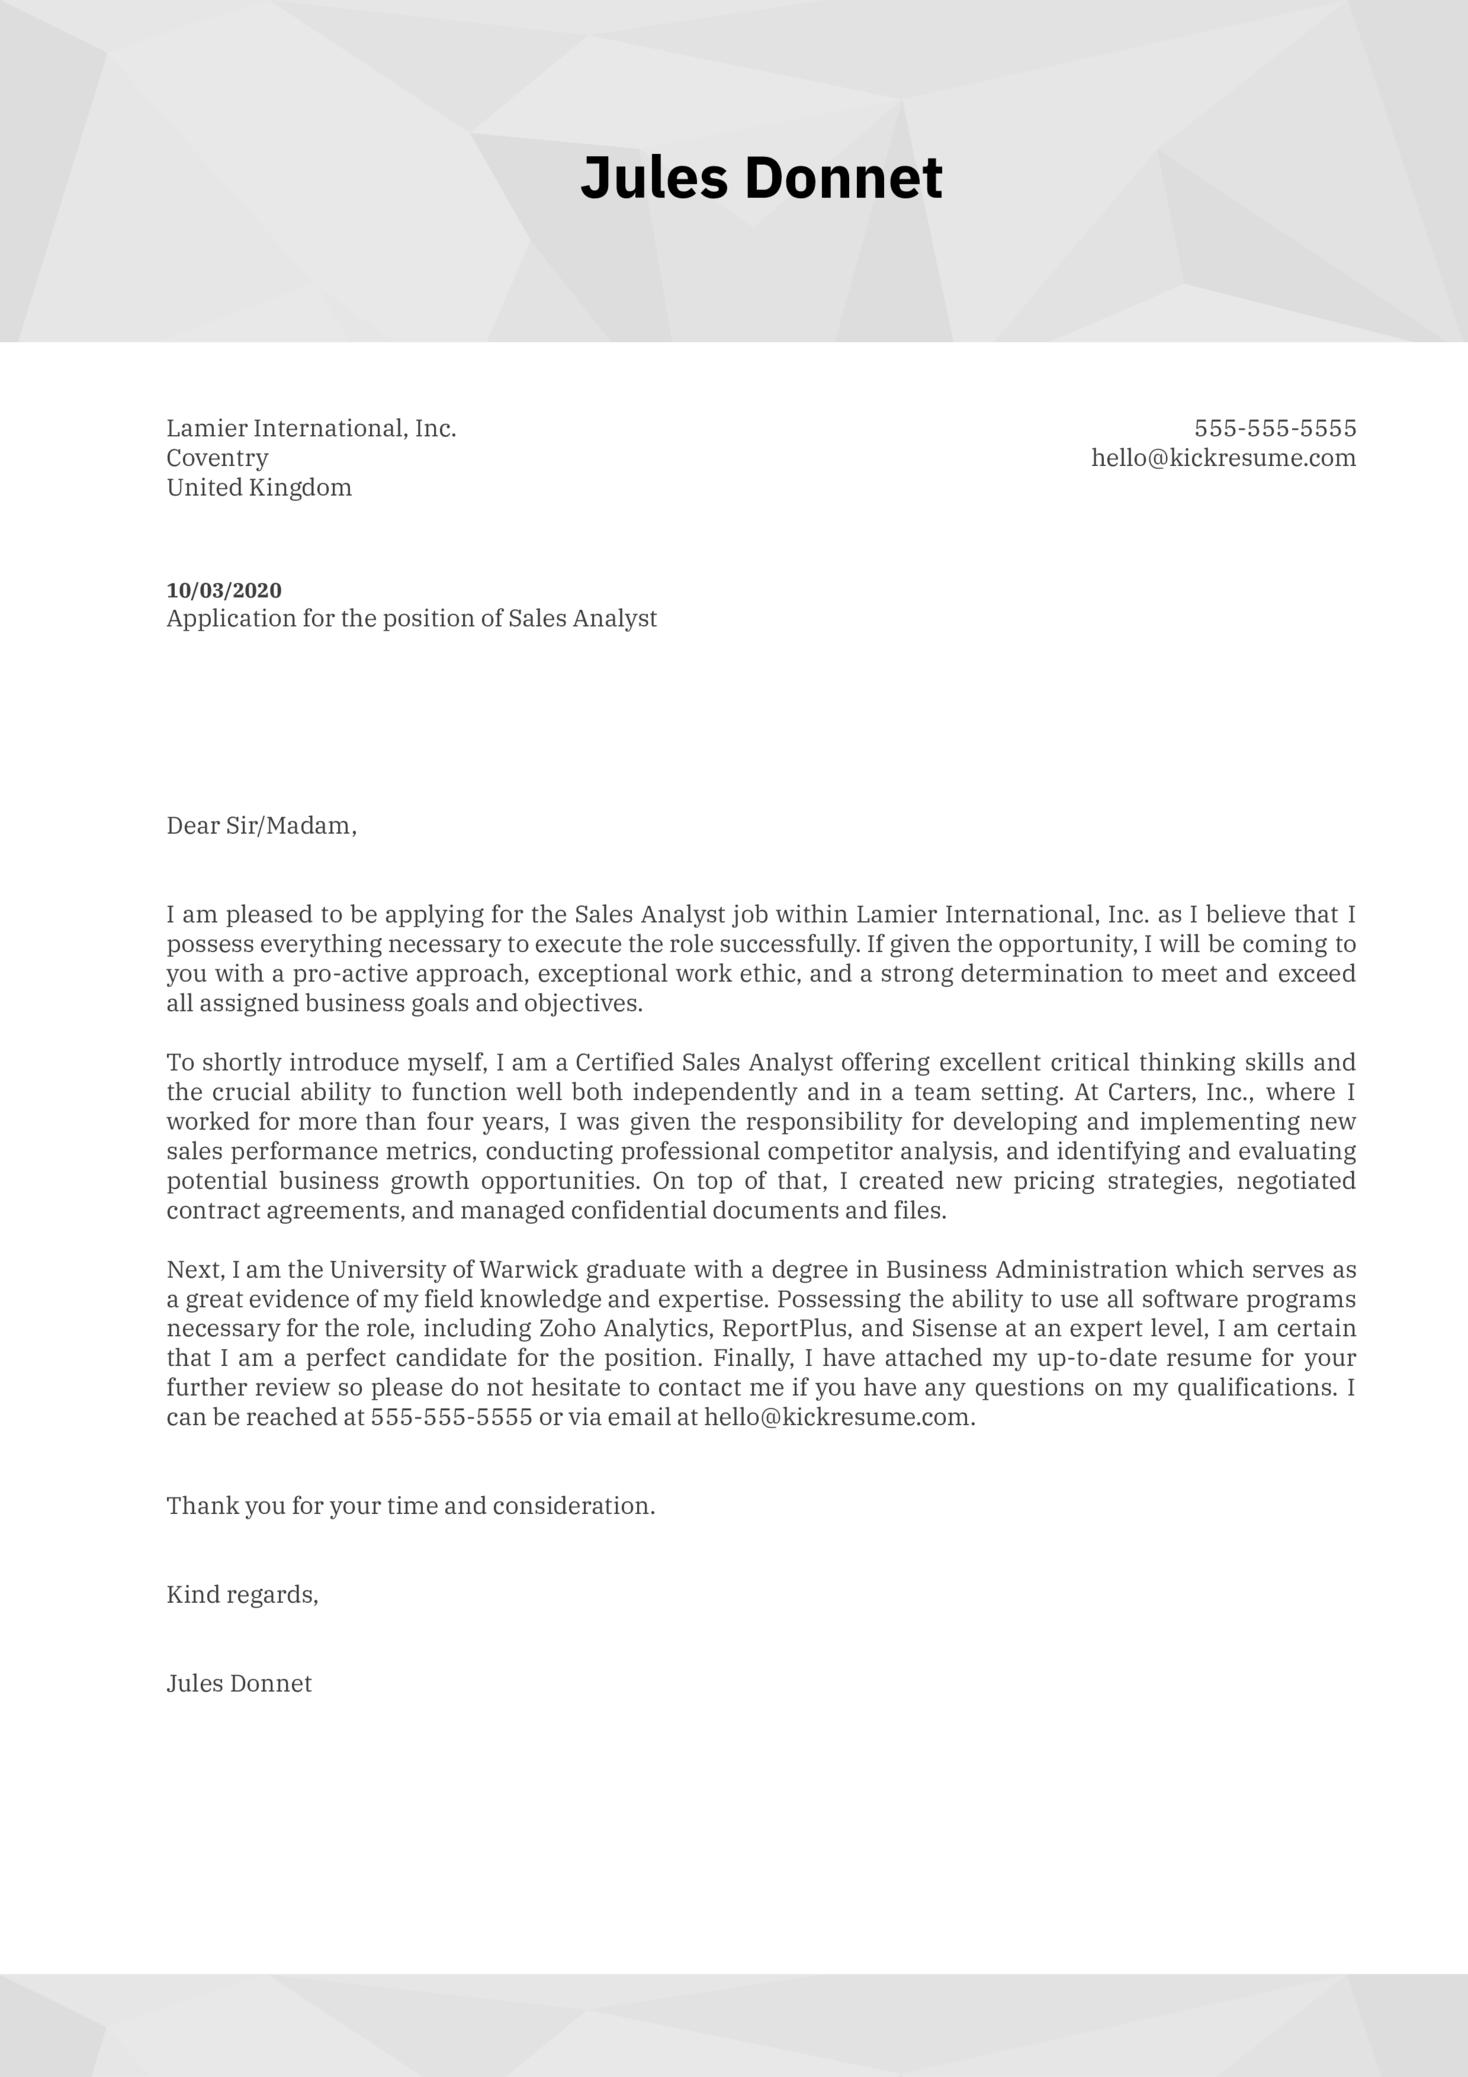 Sales Analyst Cover Letter Sample Kickresume